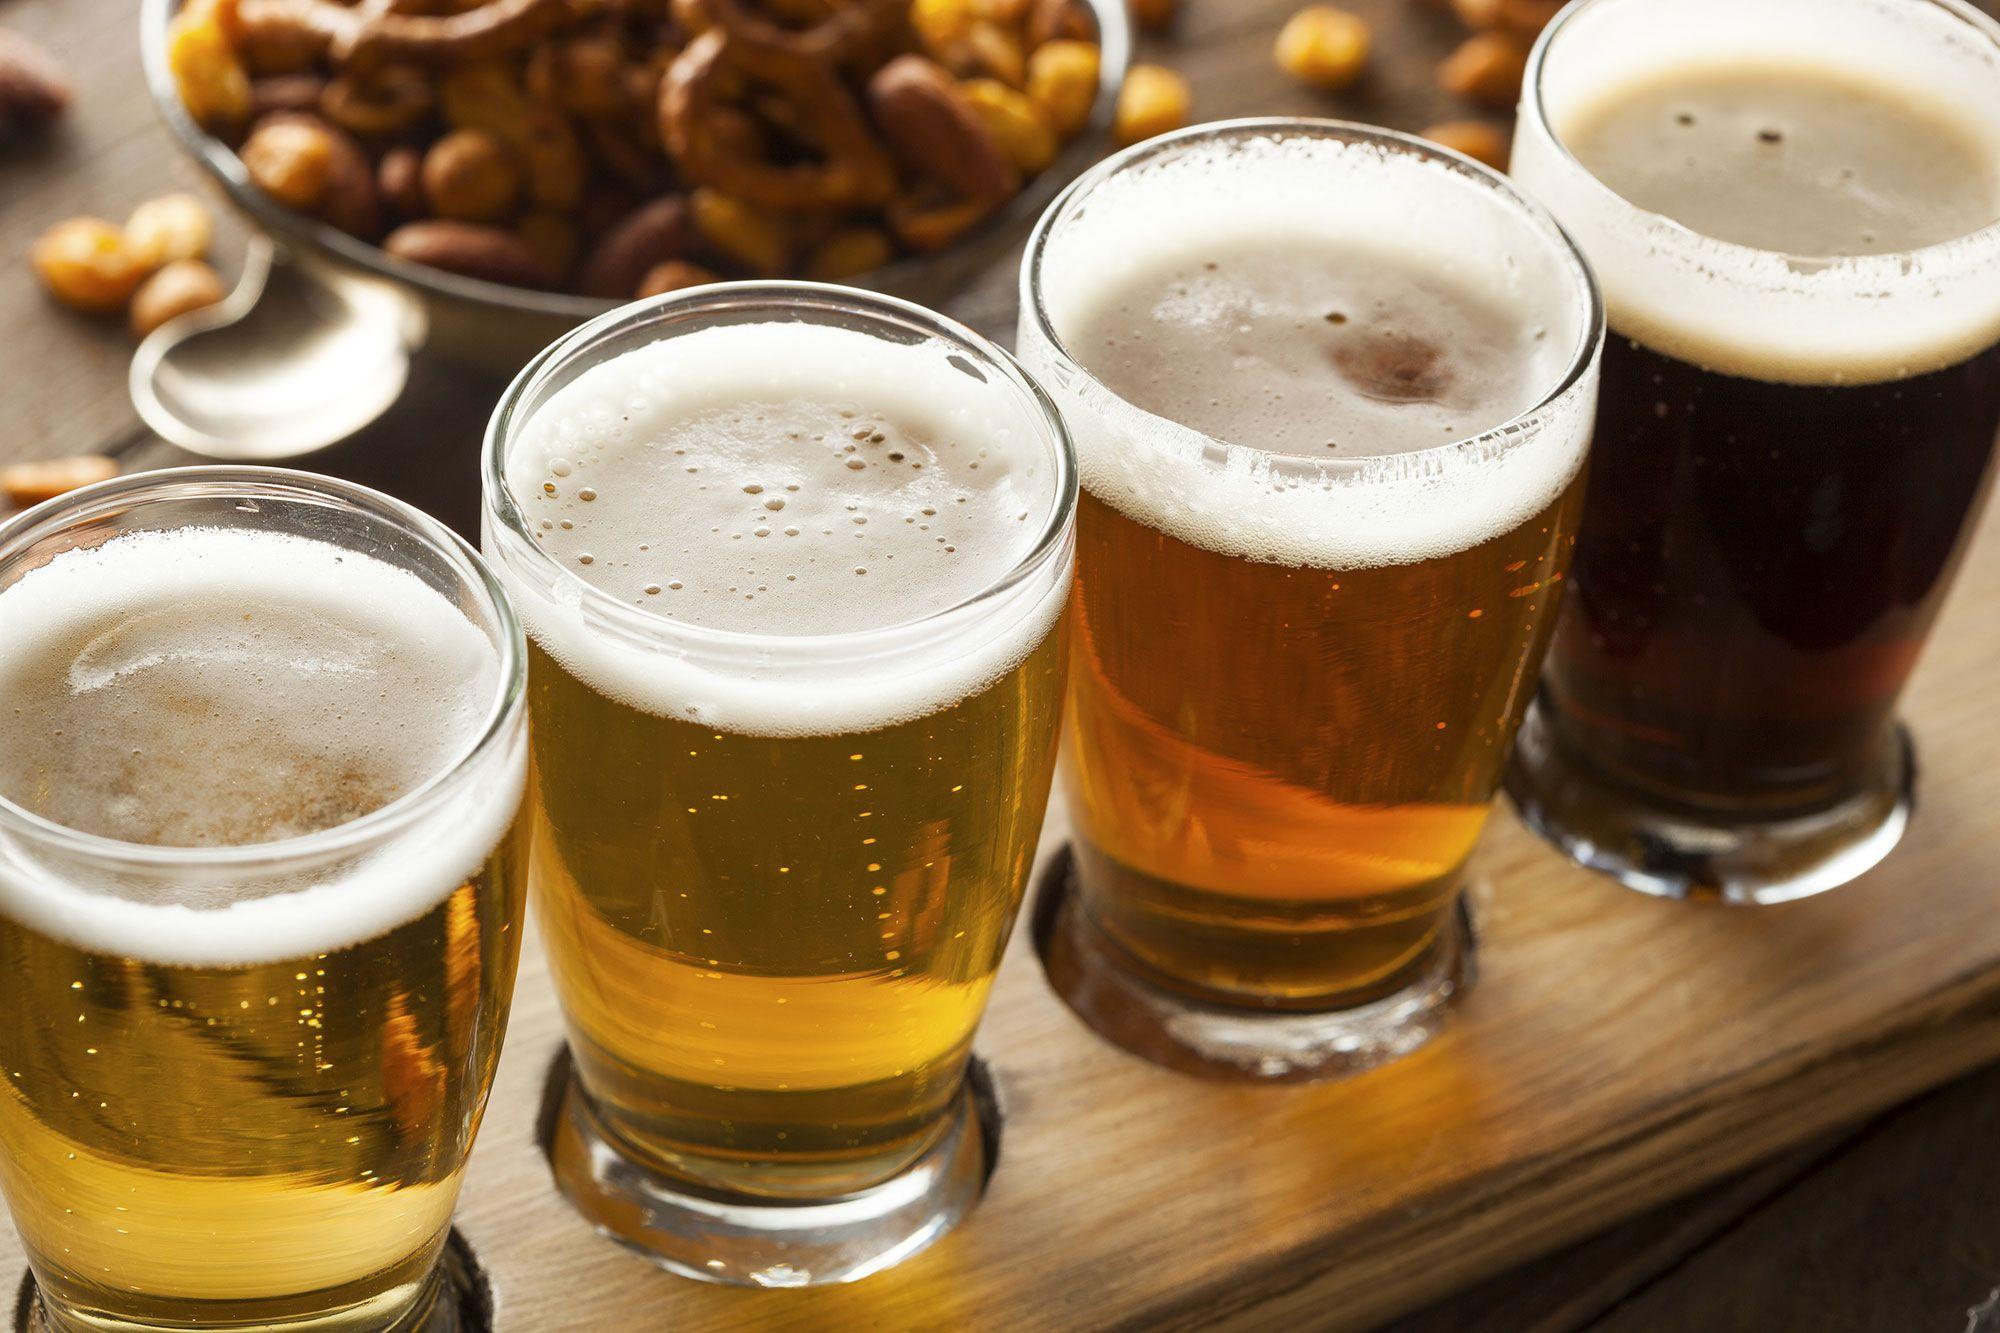 5 pasos para servir una botella de cerveza perfecta